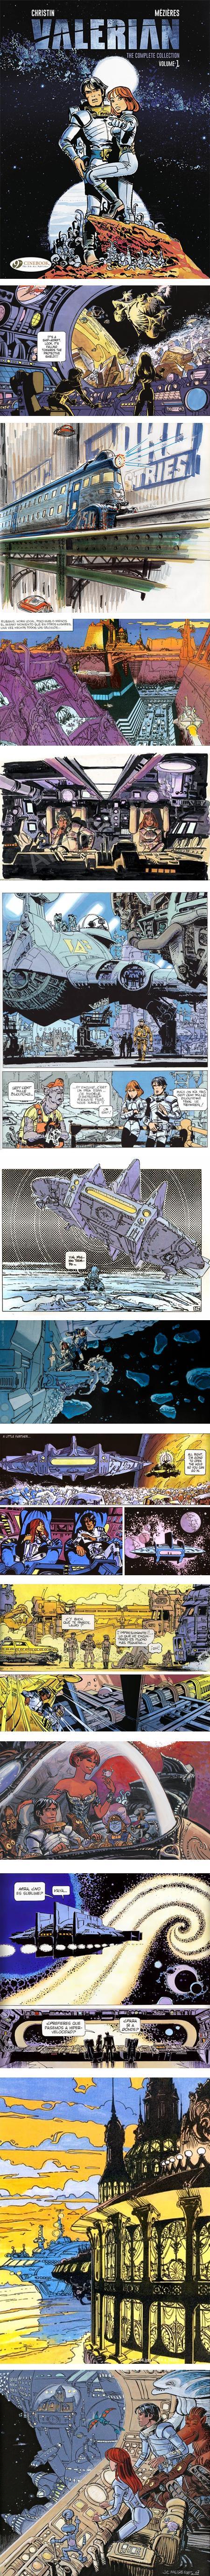 Jean-Claude Mezieres, French comics artist, Valerian and Laureline